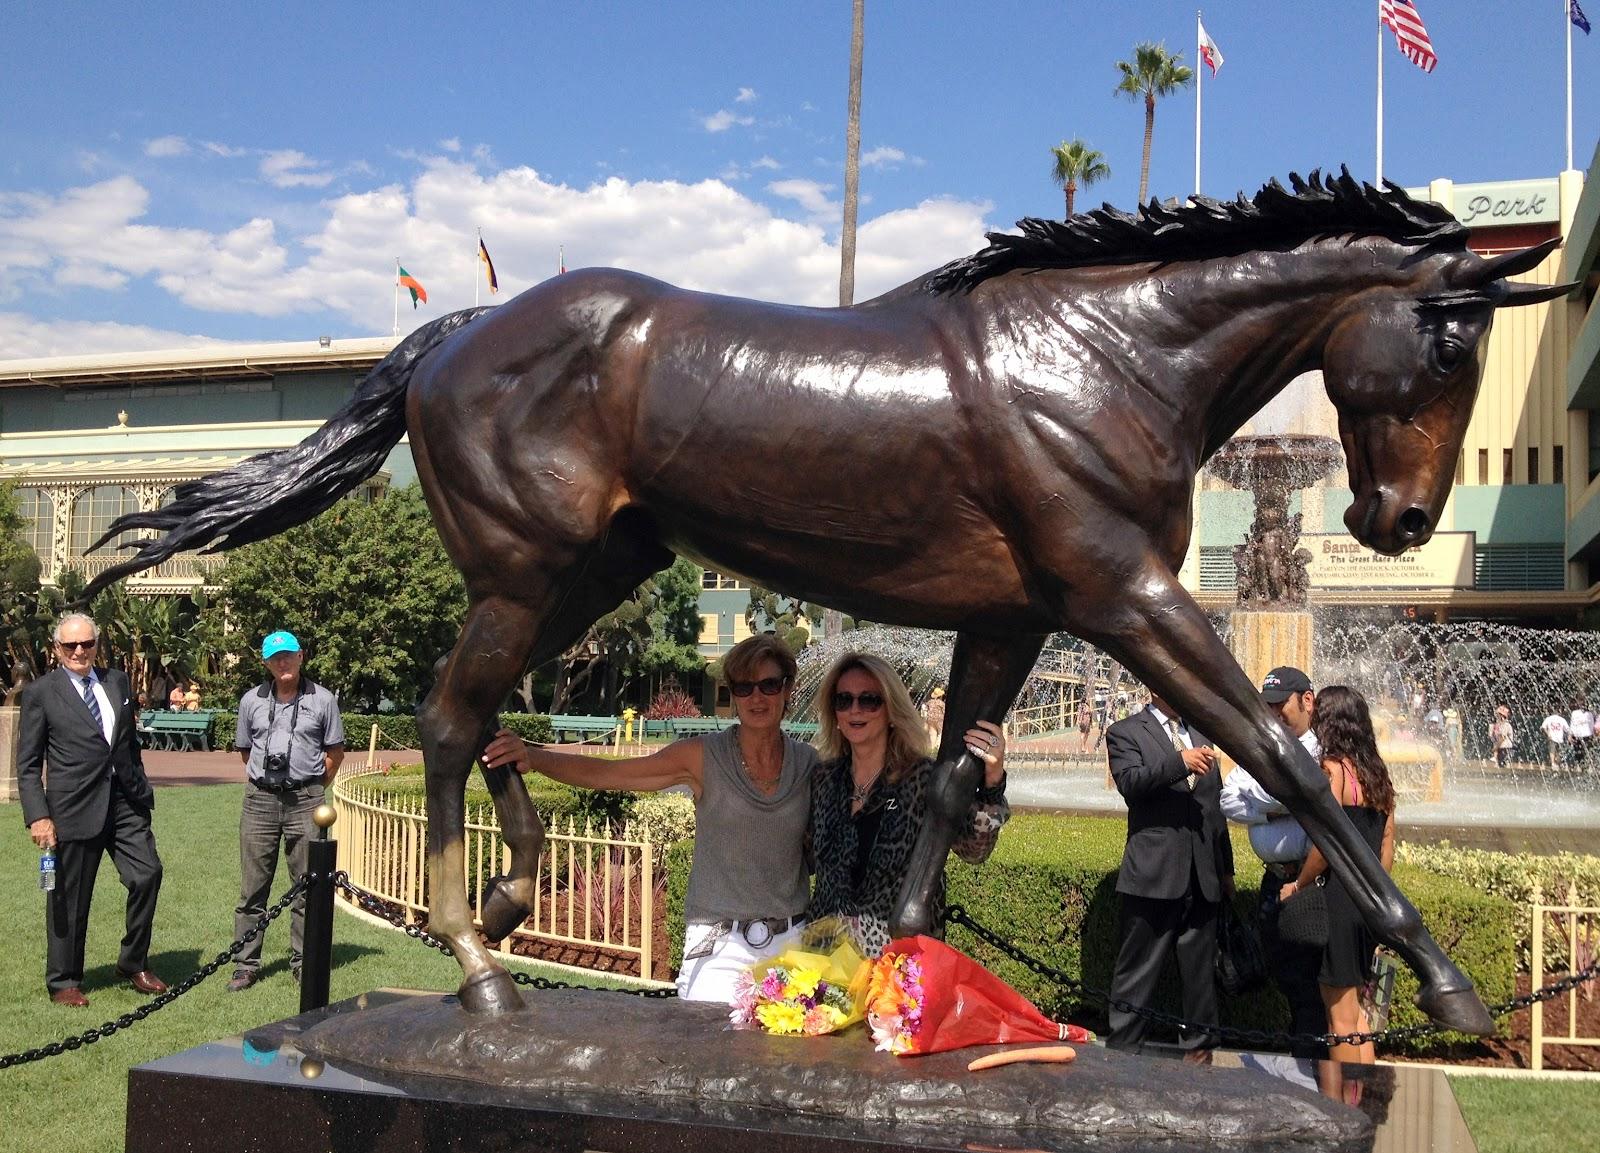 Mary Forney S Blog Zenyatta Statue Unveiled At Santa Anita